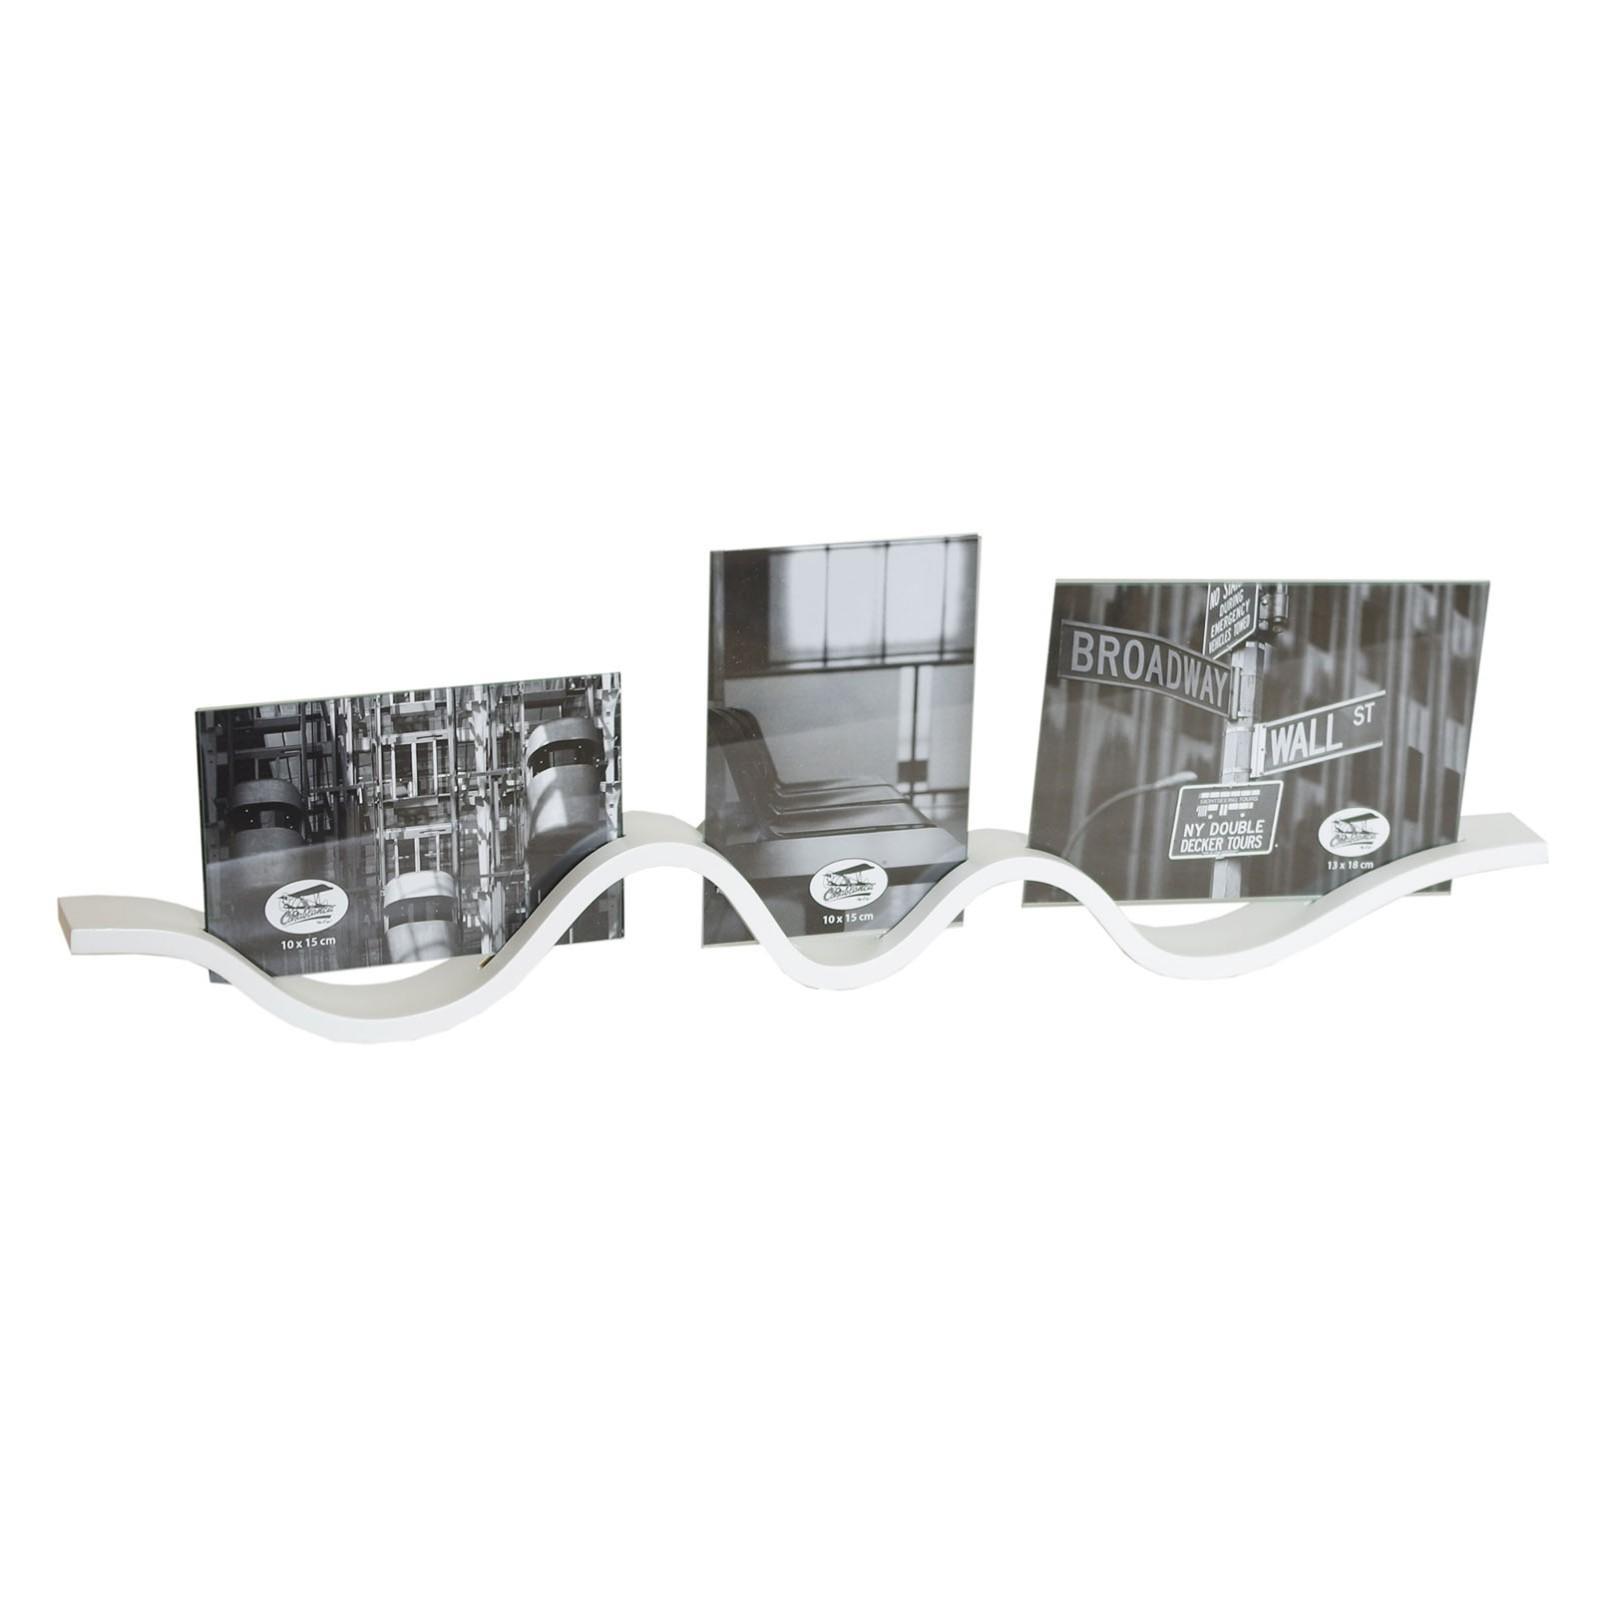 Fotorahmen weiss 3Bilder Waves 56x17cm MDF Bilderrahmen